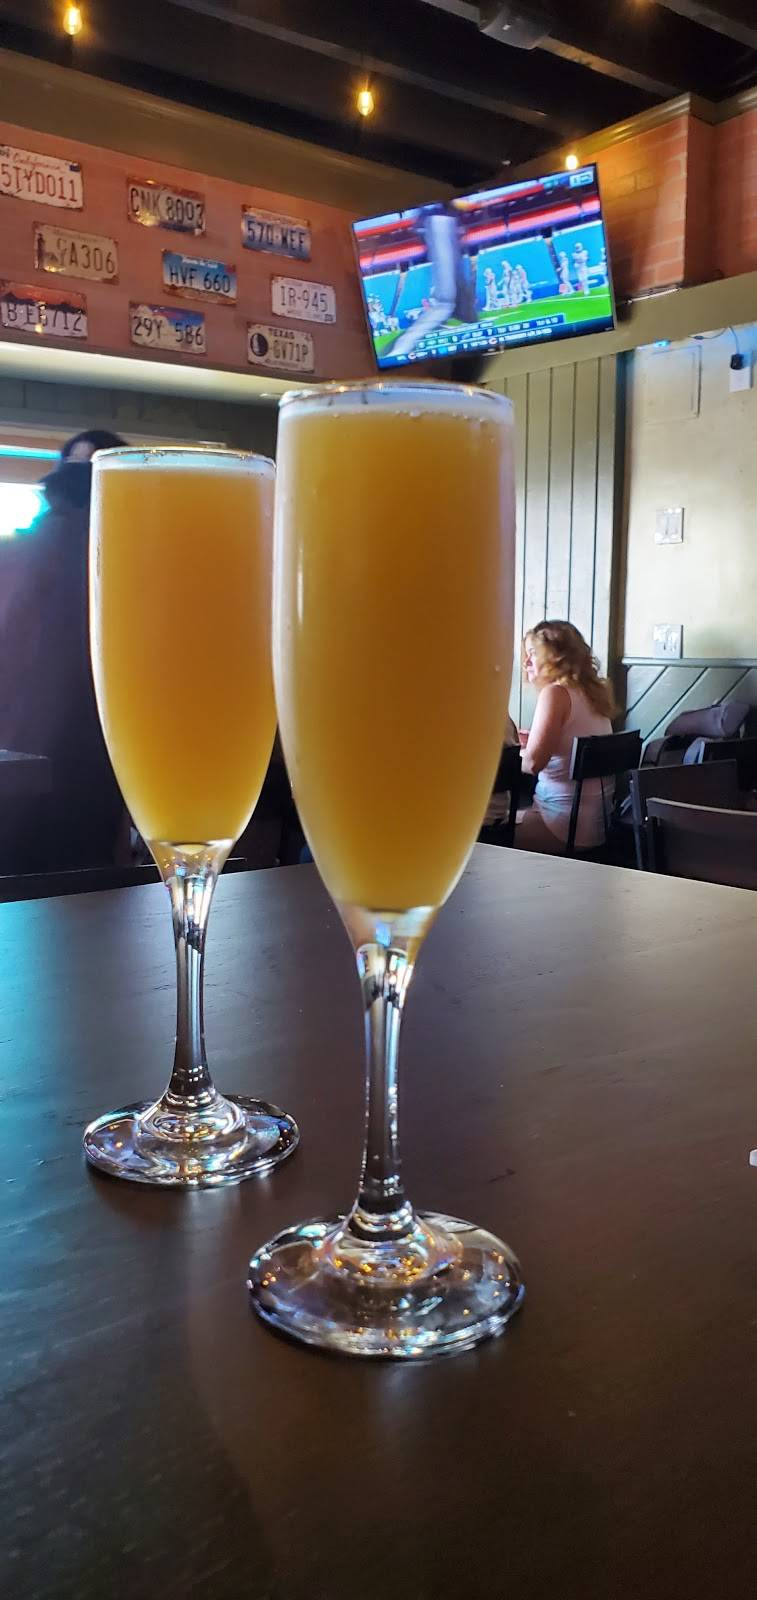 Del Sur | restaurant | 451 Atlantic Ave, East Rockaway, NY 11518, USA | 6315612344 OR +1 631-561-2344